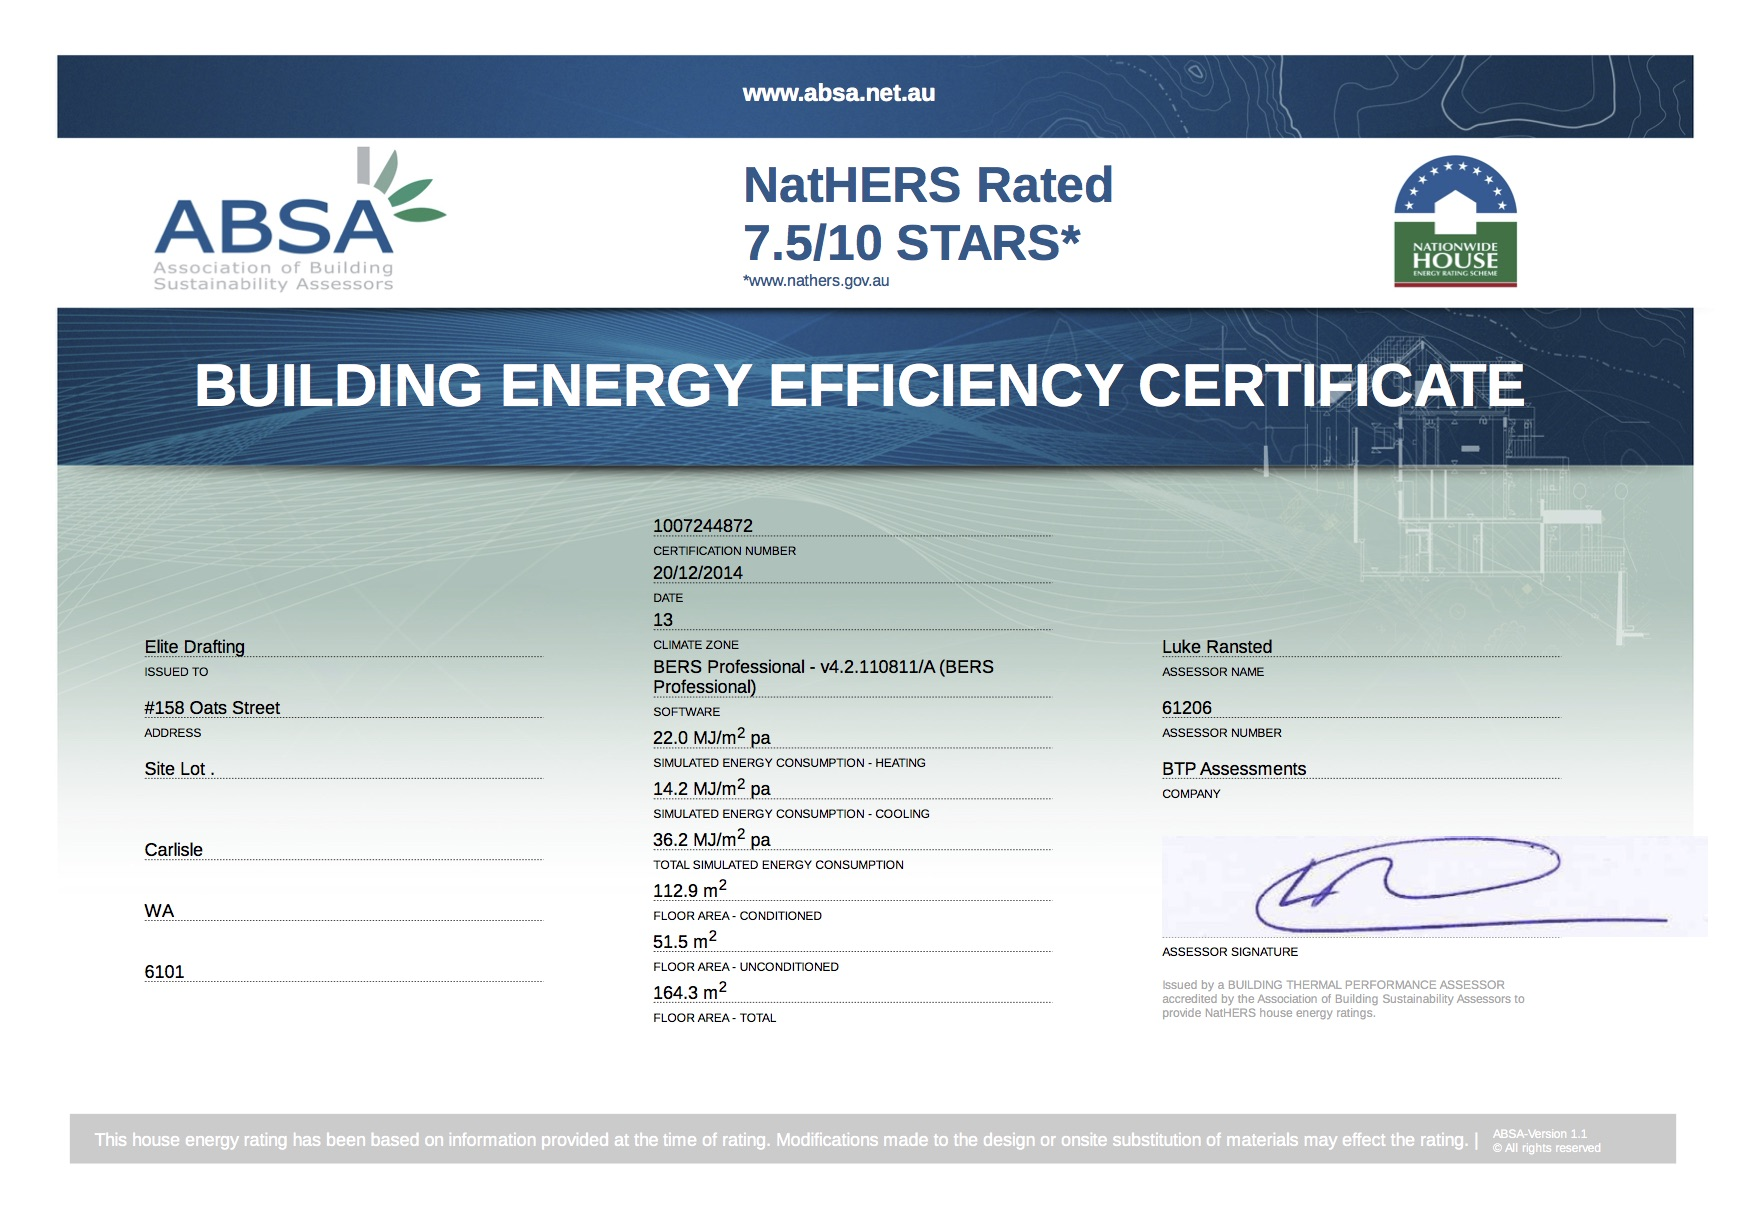 Building energy efficiency certificate cover